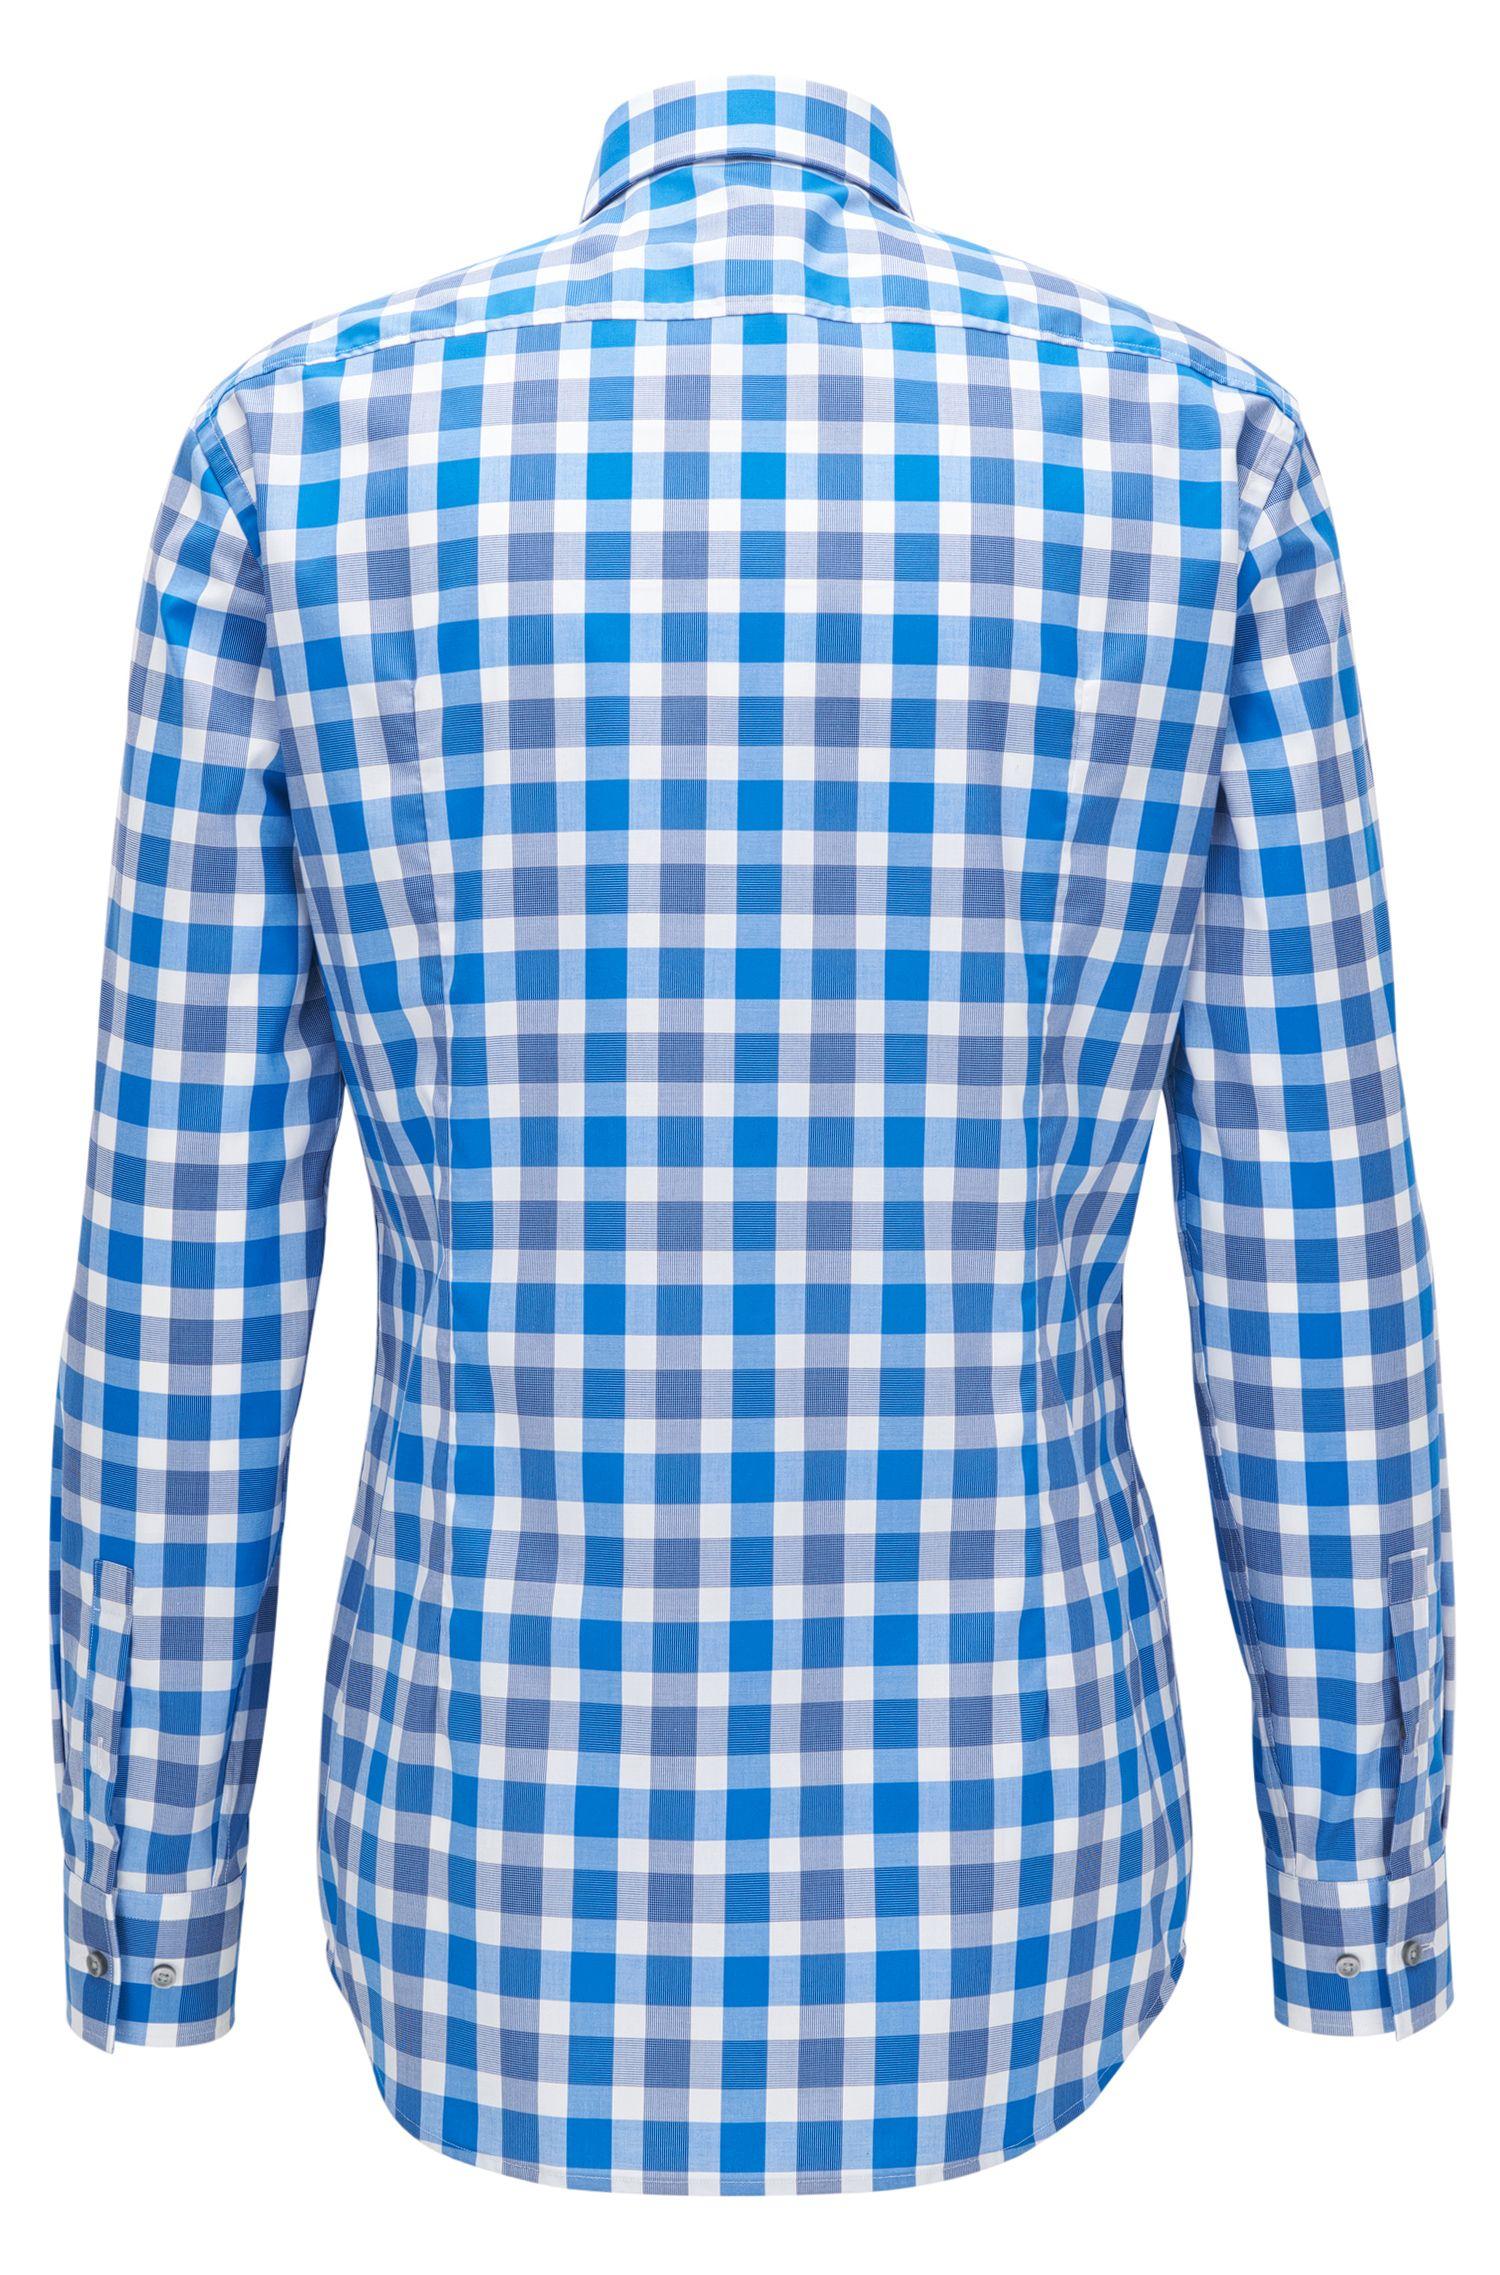 Checked Cotton Dress Shirt, Slim Fit | Jason, Blue